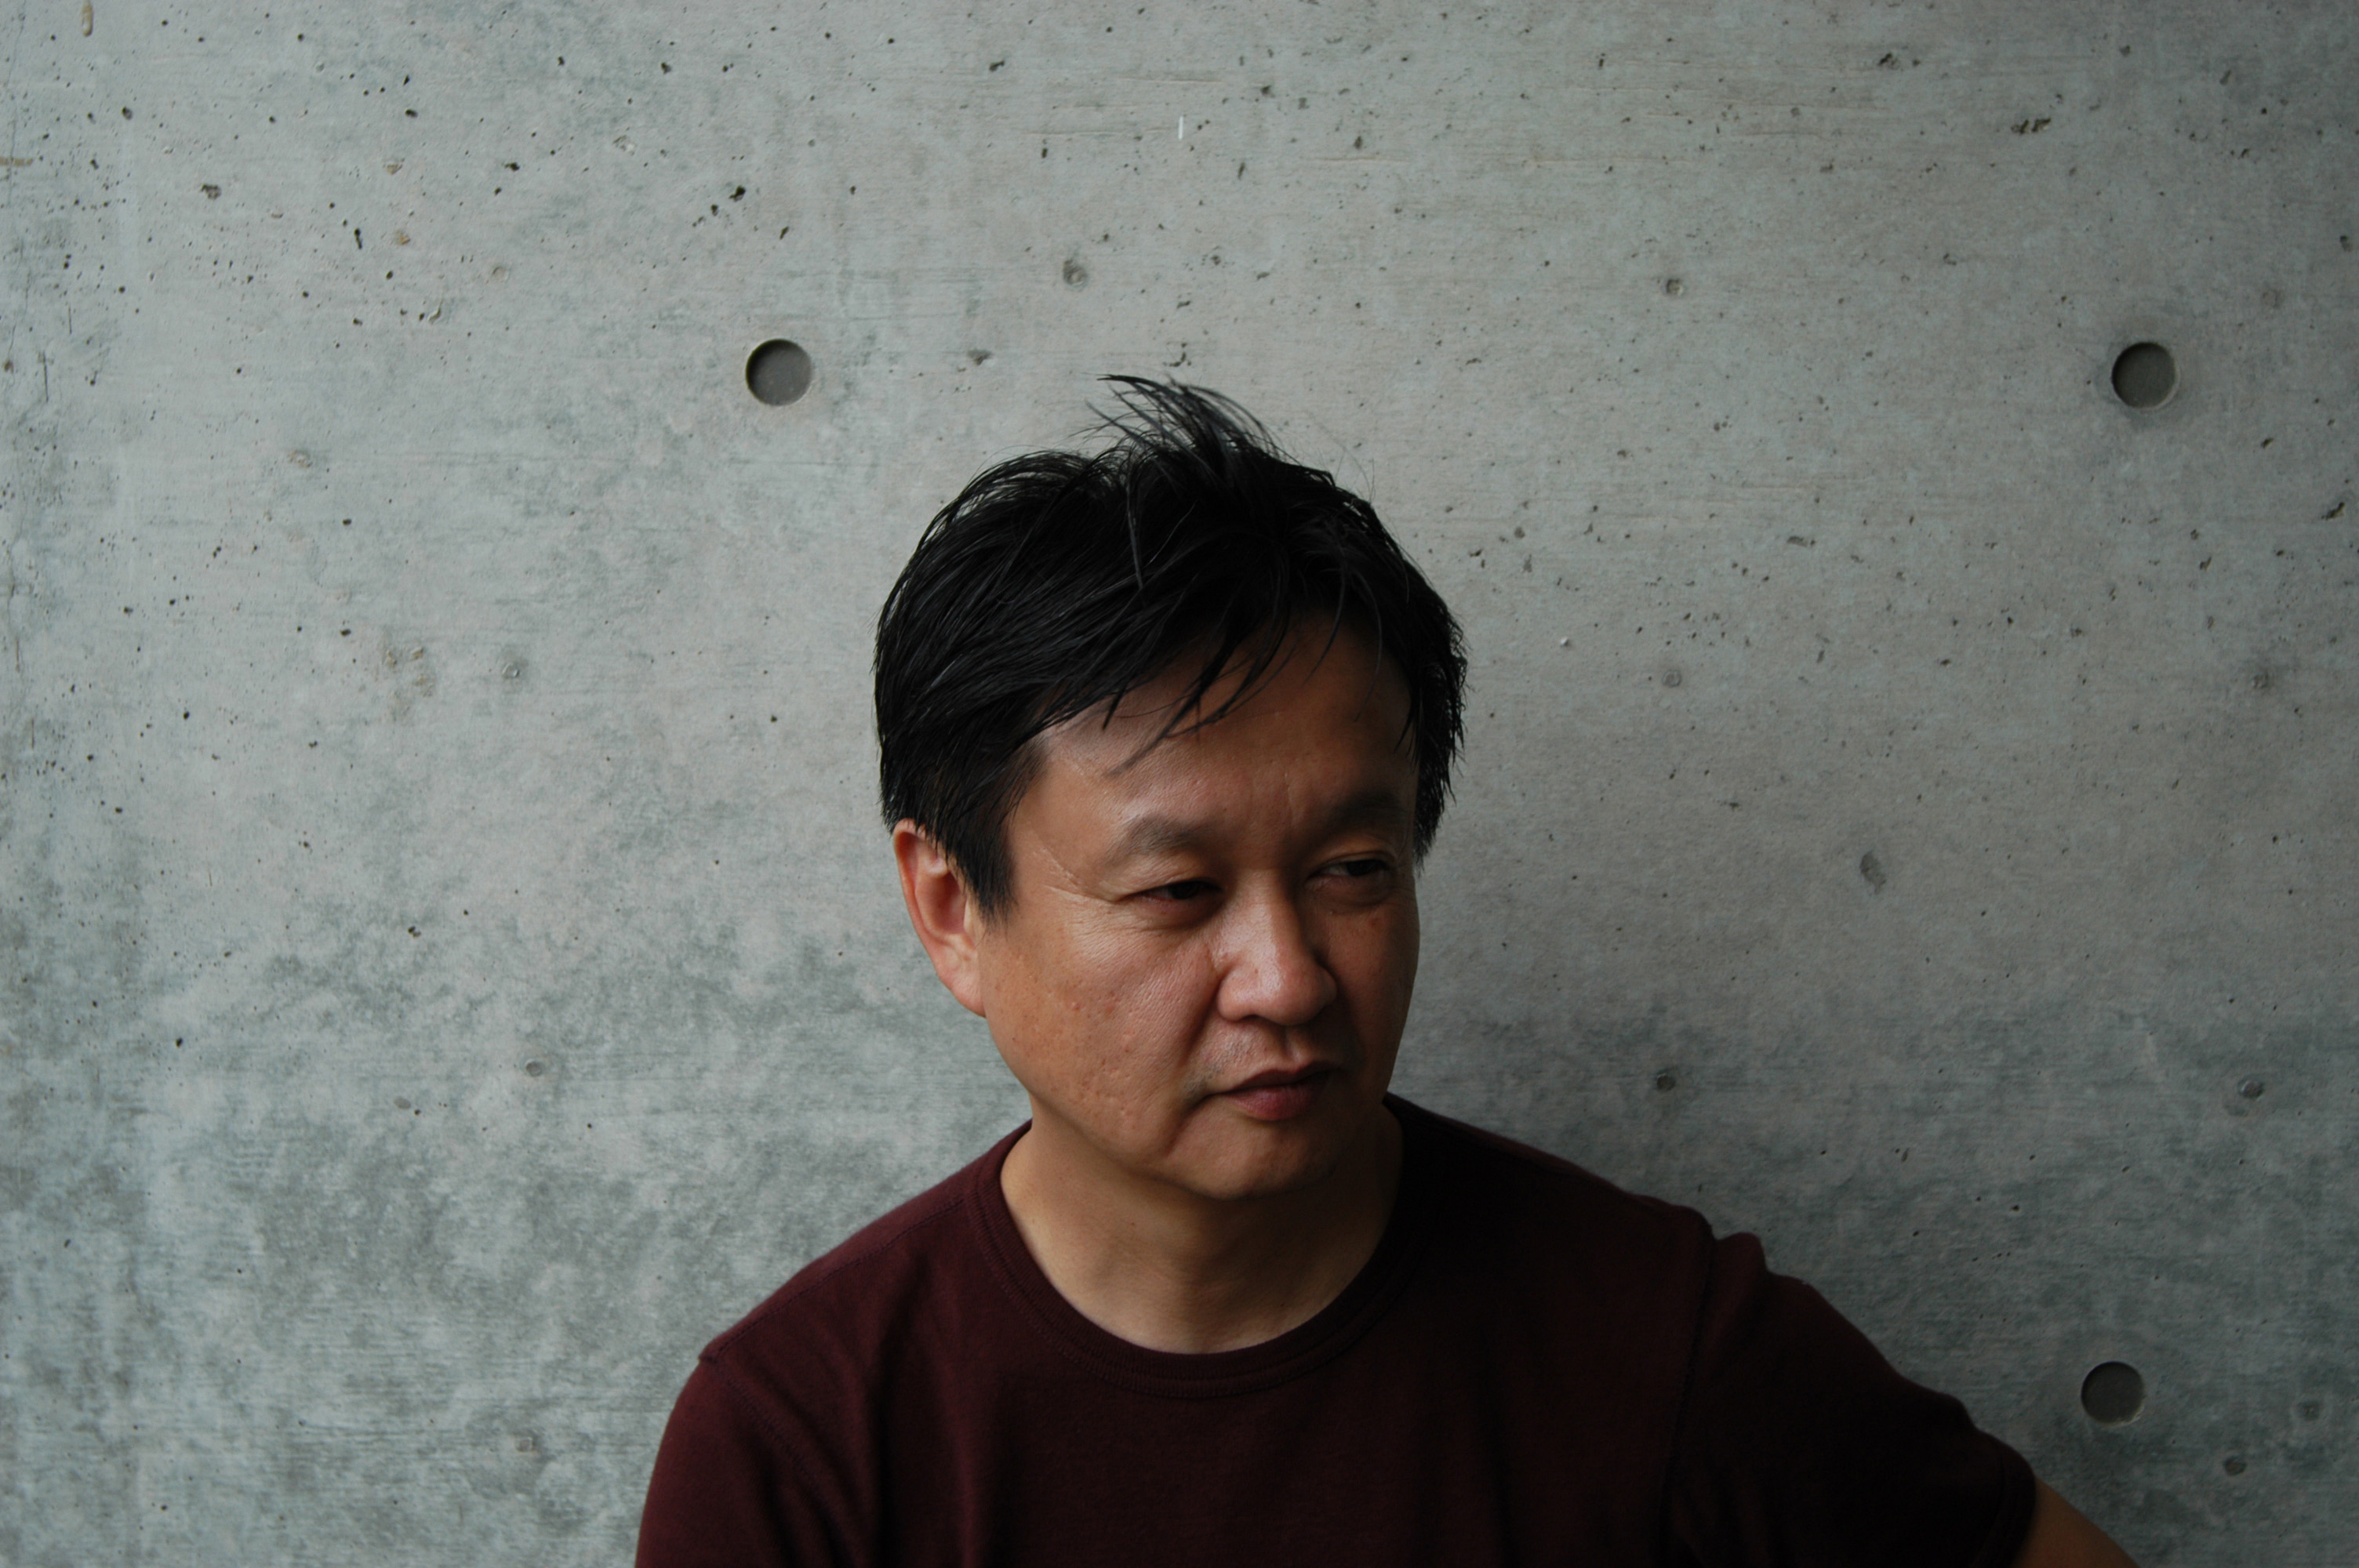 Naotao Fukasawa